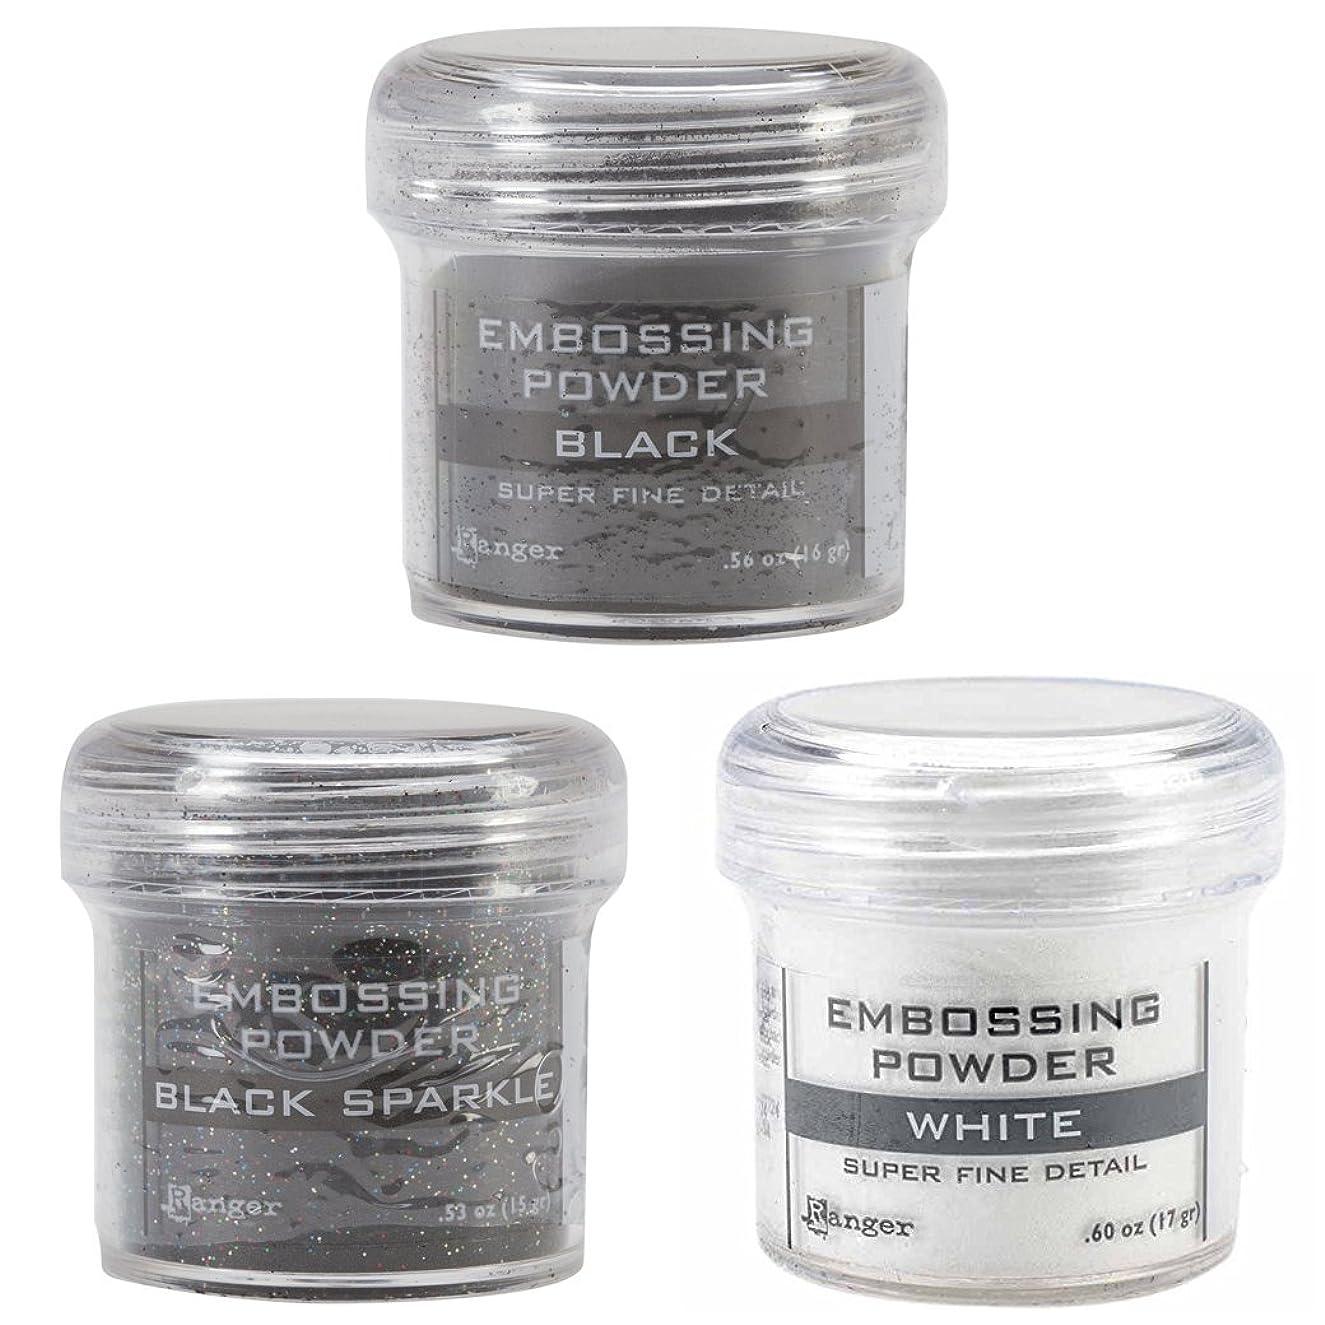 Ranger Embossing Powder Bundle of 3 Black and White Colors: Super Fine Black, Black Sparkle, and Super Fine White